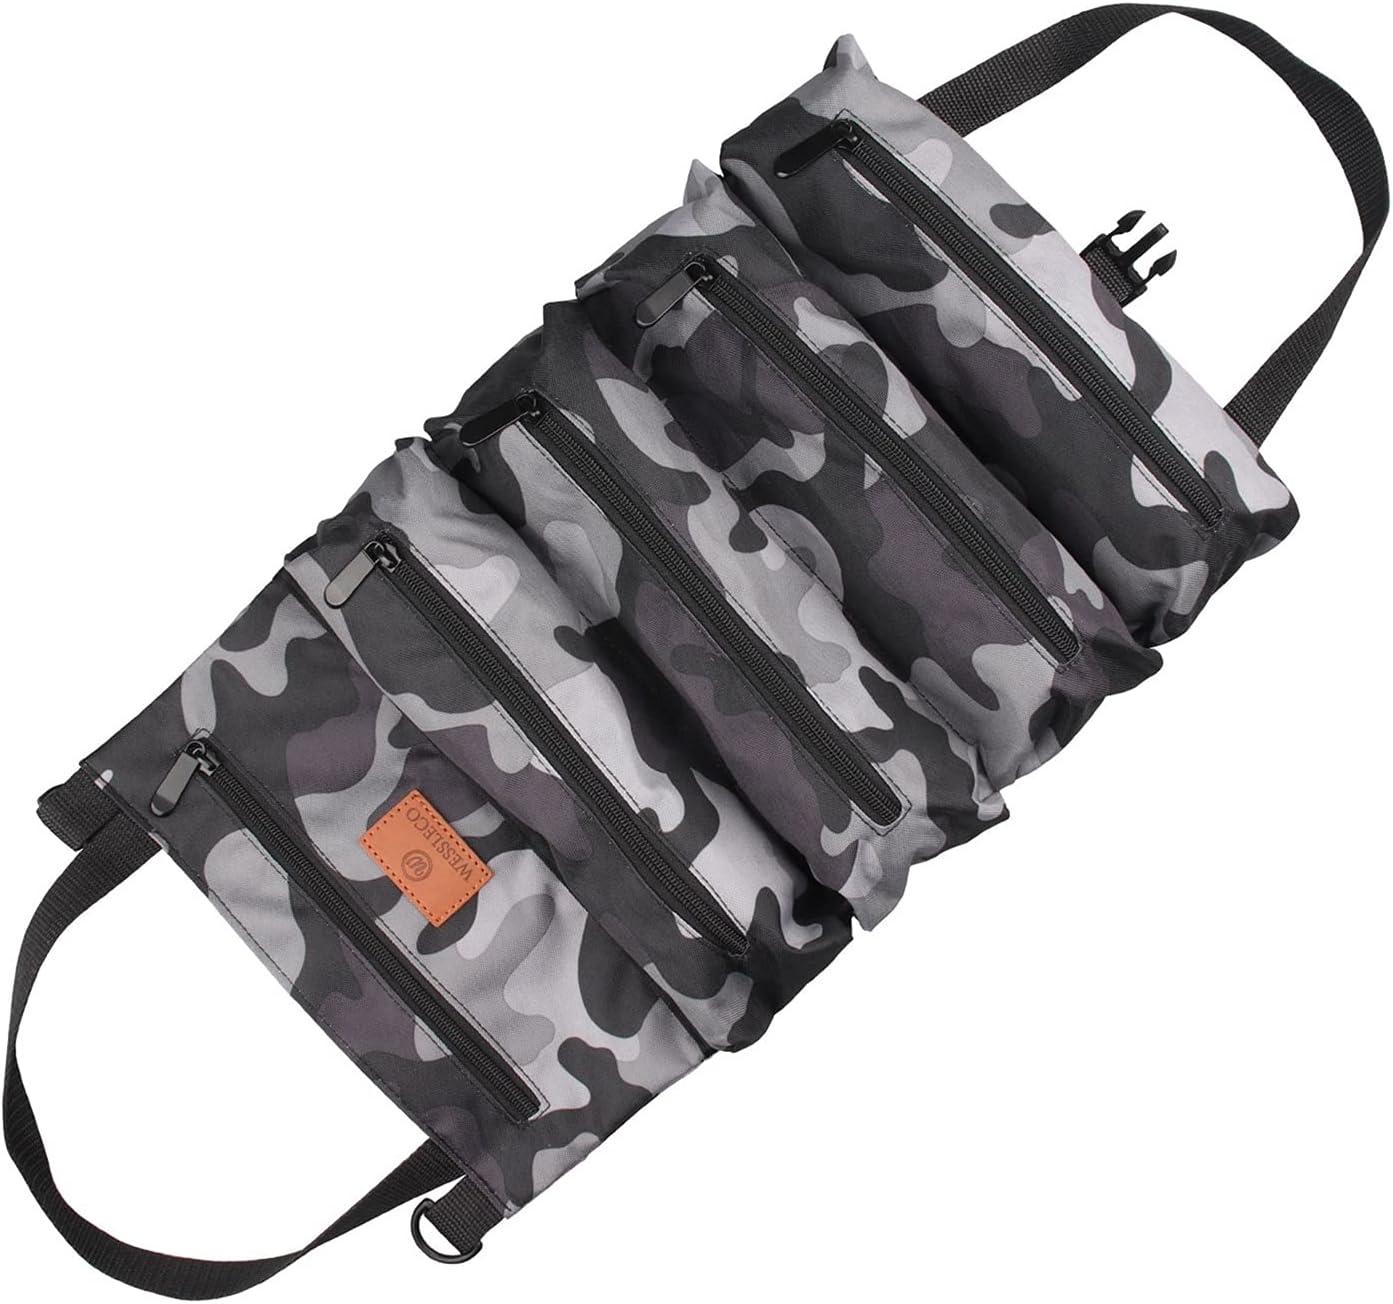 WYN Rolled Up Tool Bag Multi-Purpose Tool Bag Oxford Cloth Tool